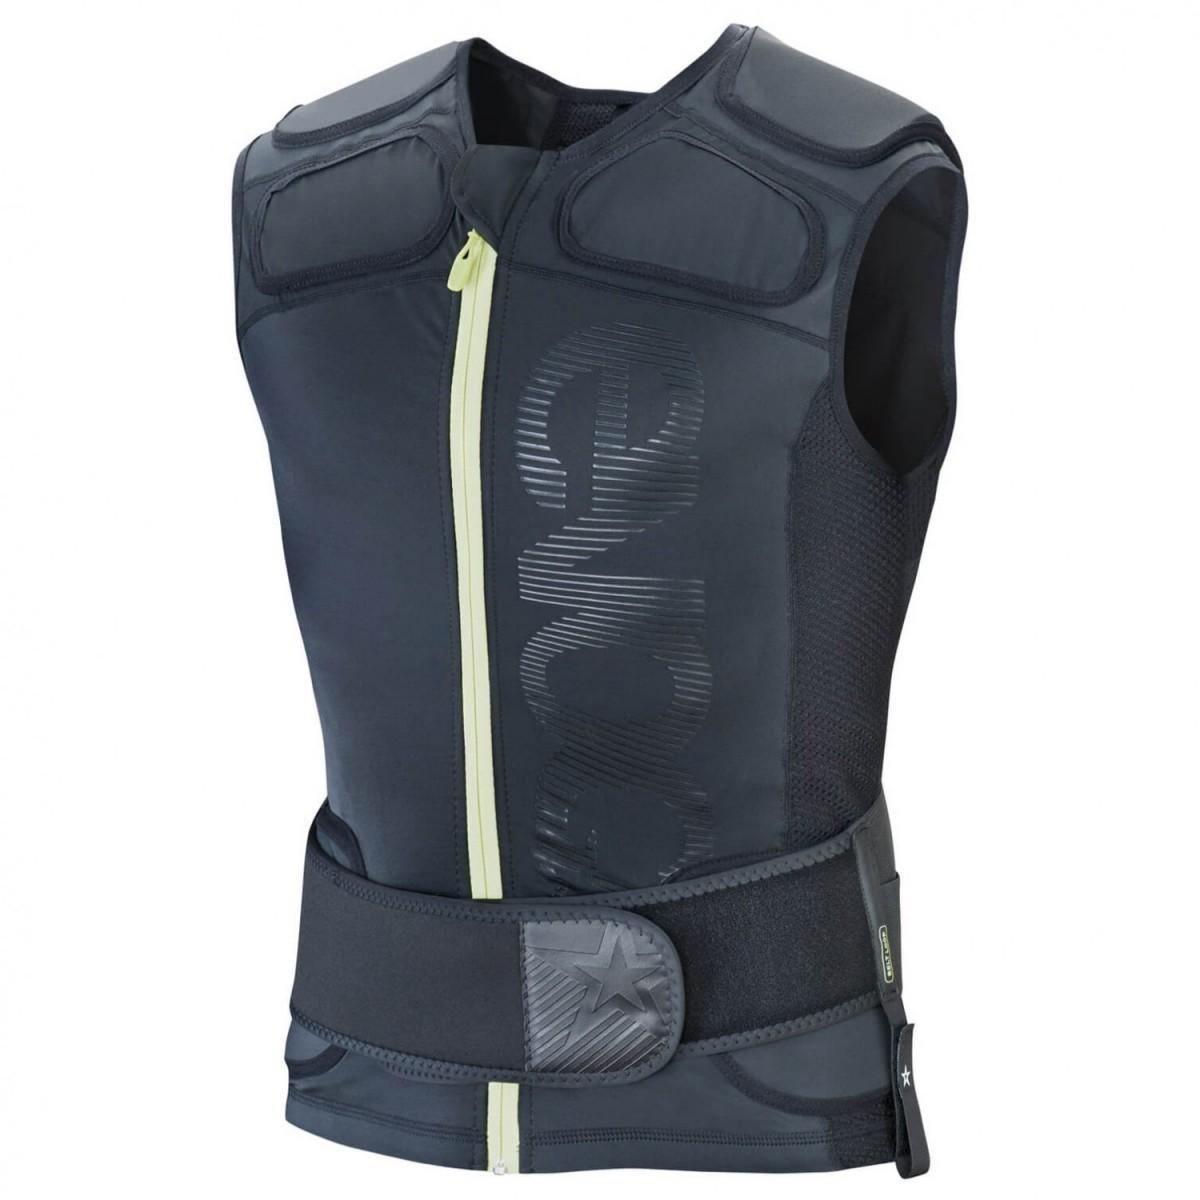 Evoc イーボック Protector Vest Air+Men (Black)★リュック・バックパック・登山・山歩・トレッキング★